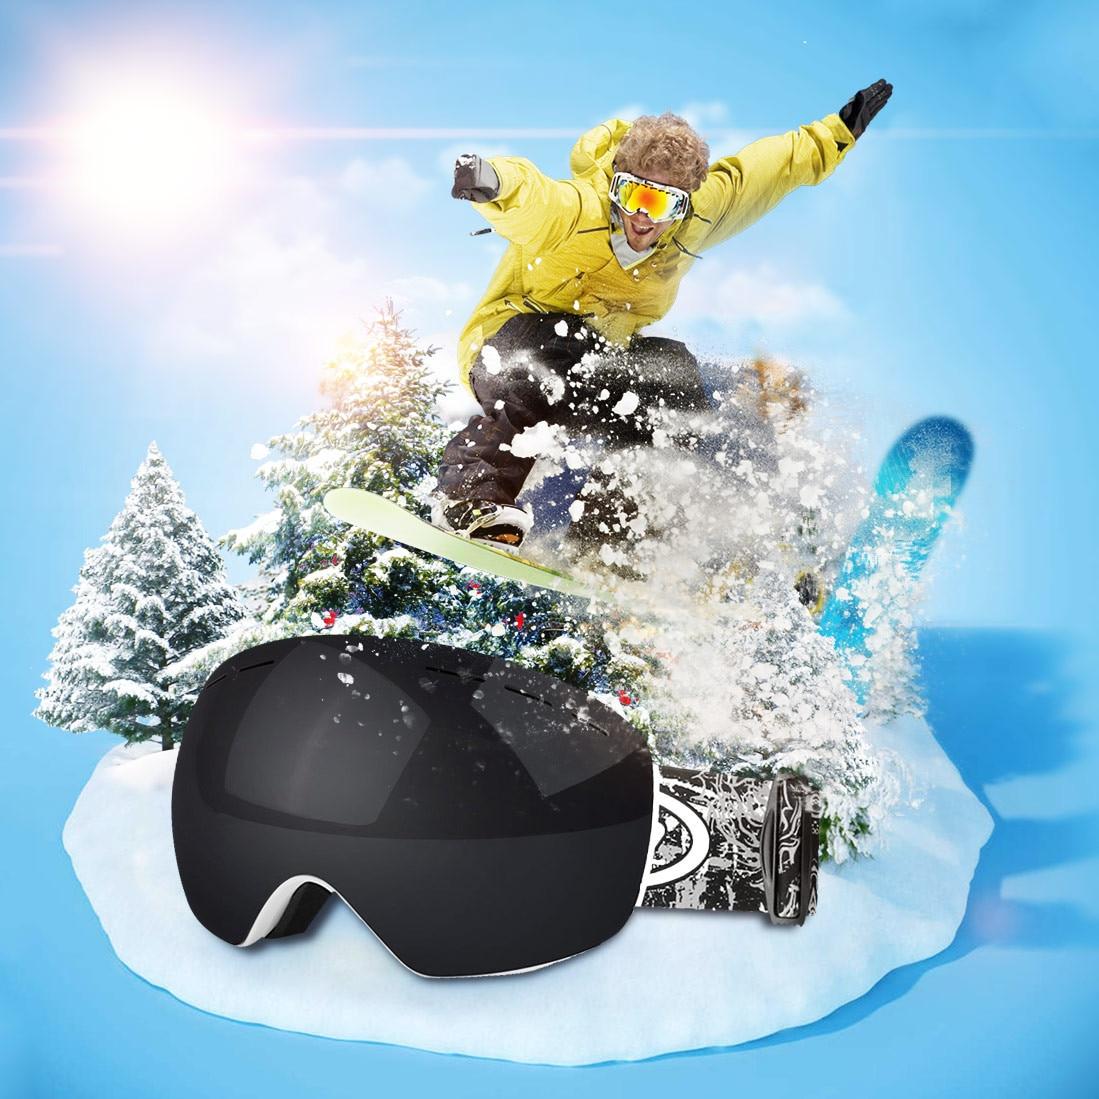 Ski Goggles Double Anti-Fog And Anti-UV Adult Spherical Double-Layer Ski Goggles Skiing Men Women Snow Snowboard Goggles 9.23